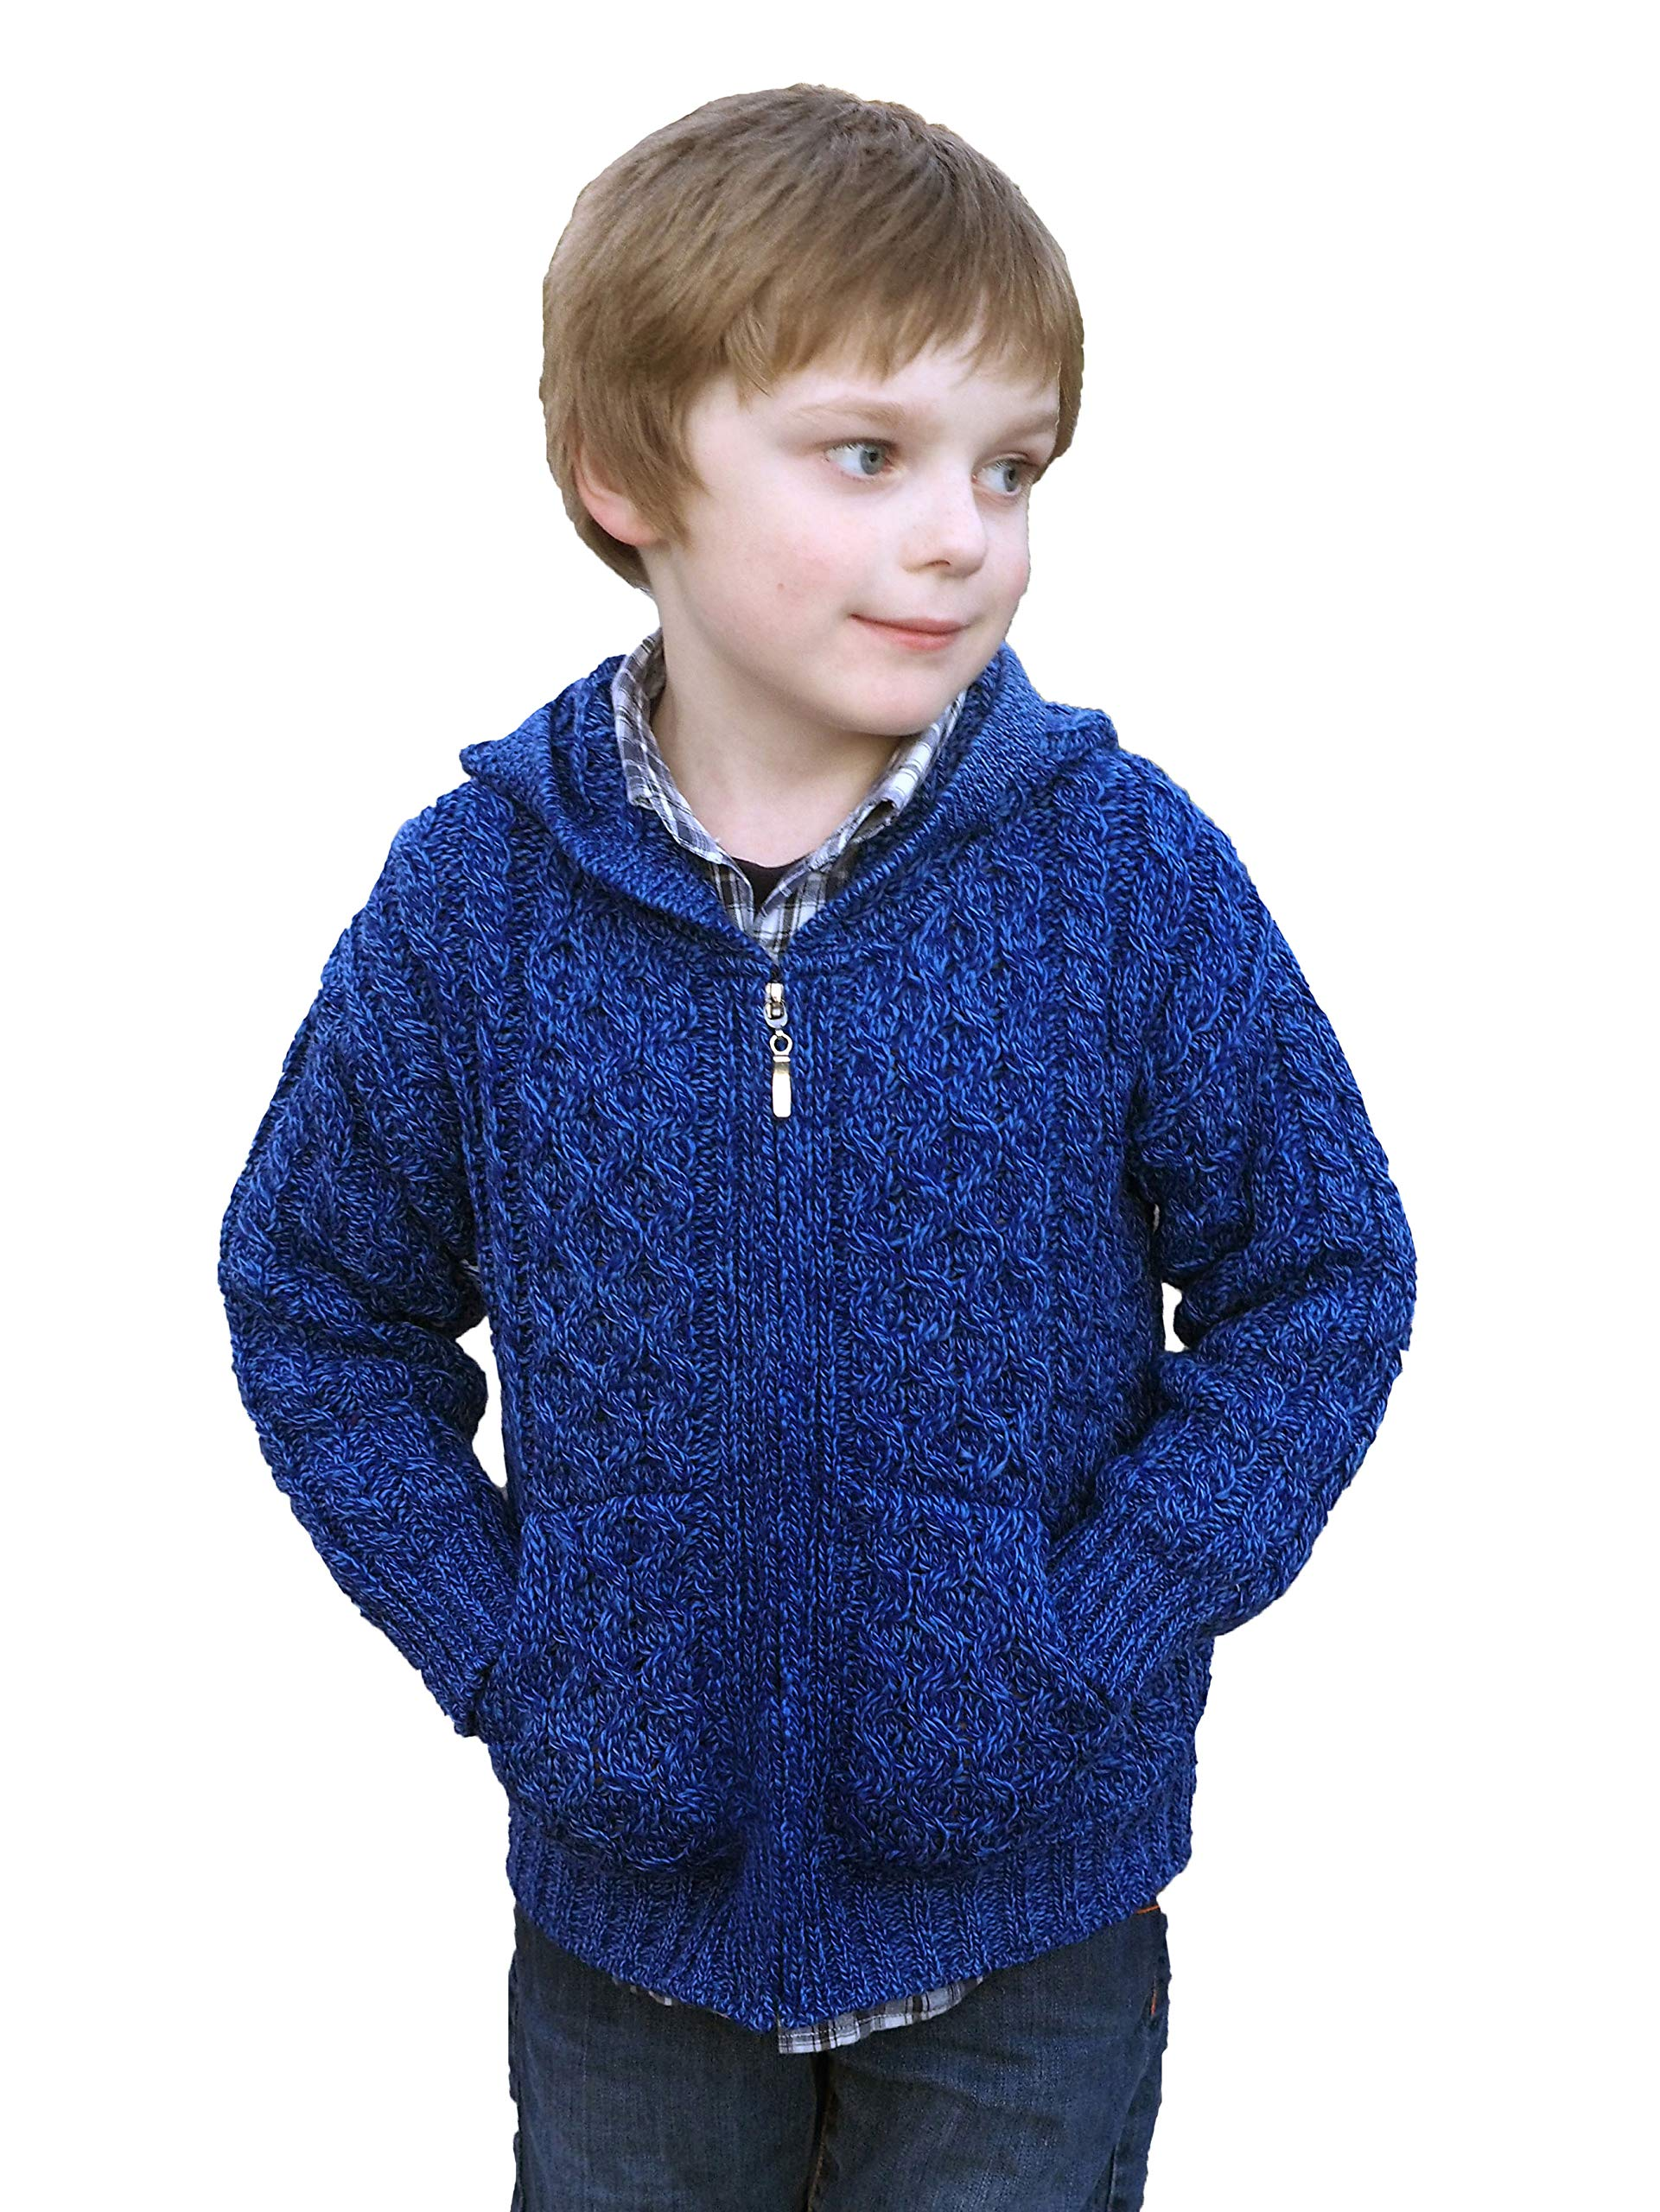 Aran Crafts Hooded Cardigan Sweater 2/3 Marl Blue (HD4039-2/3-BLU)